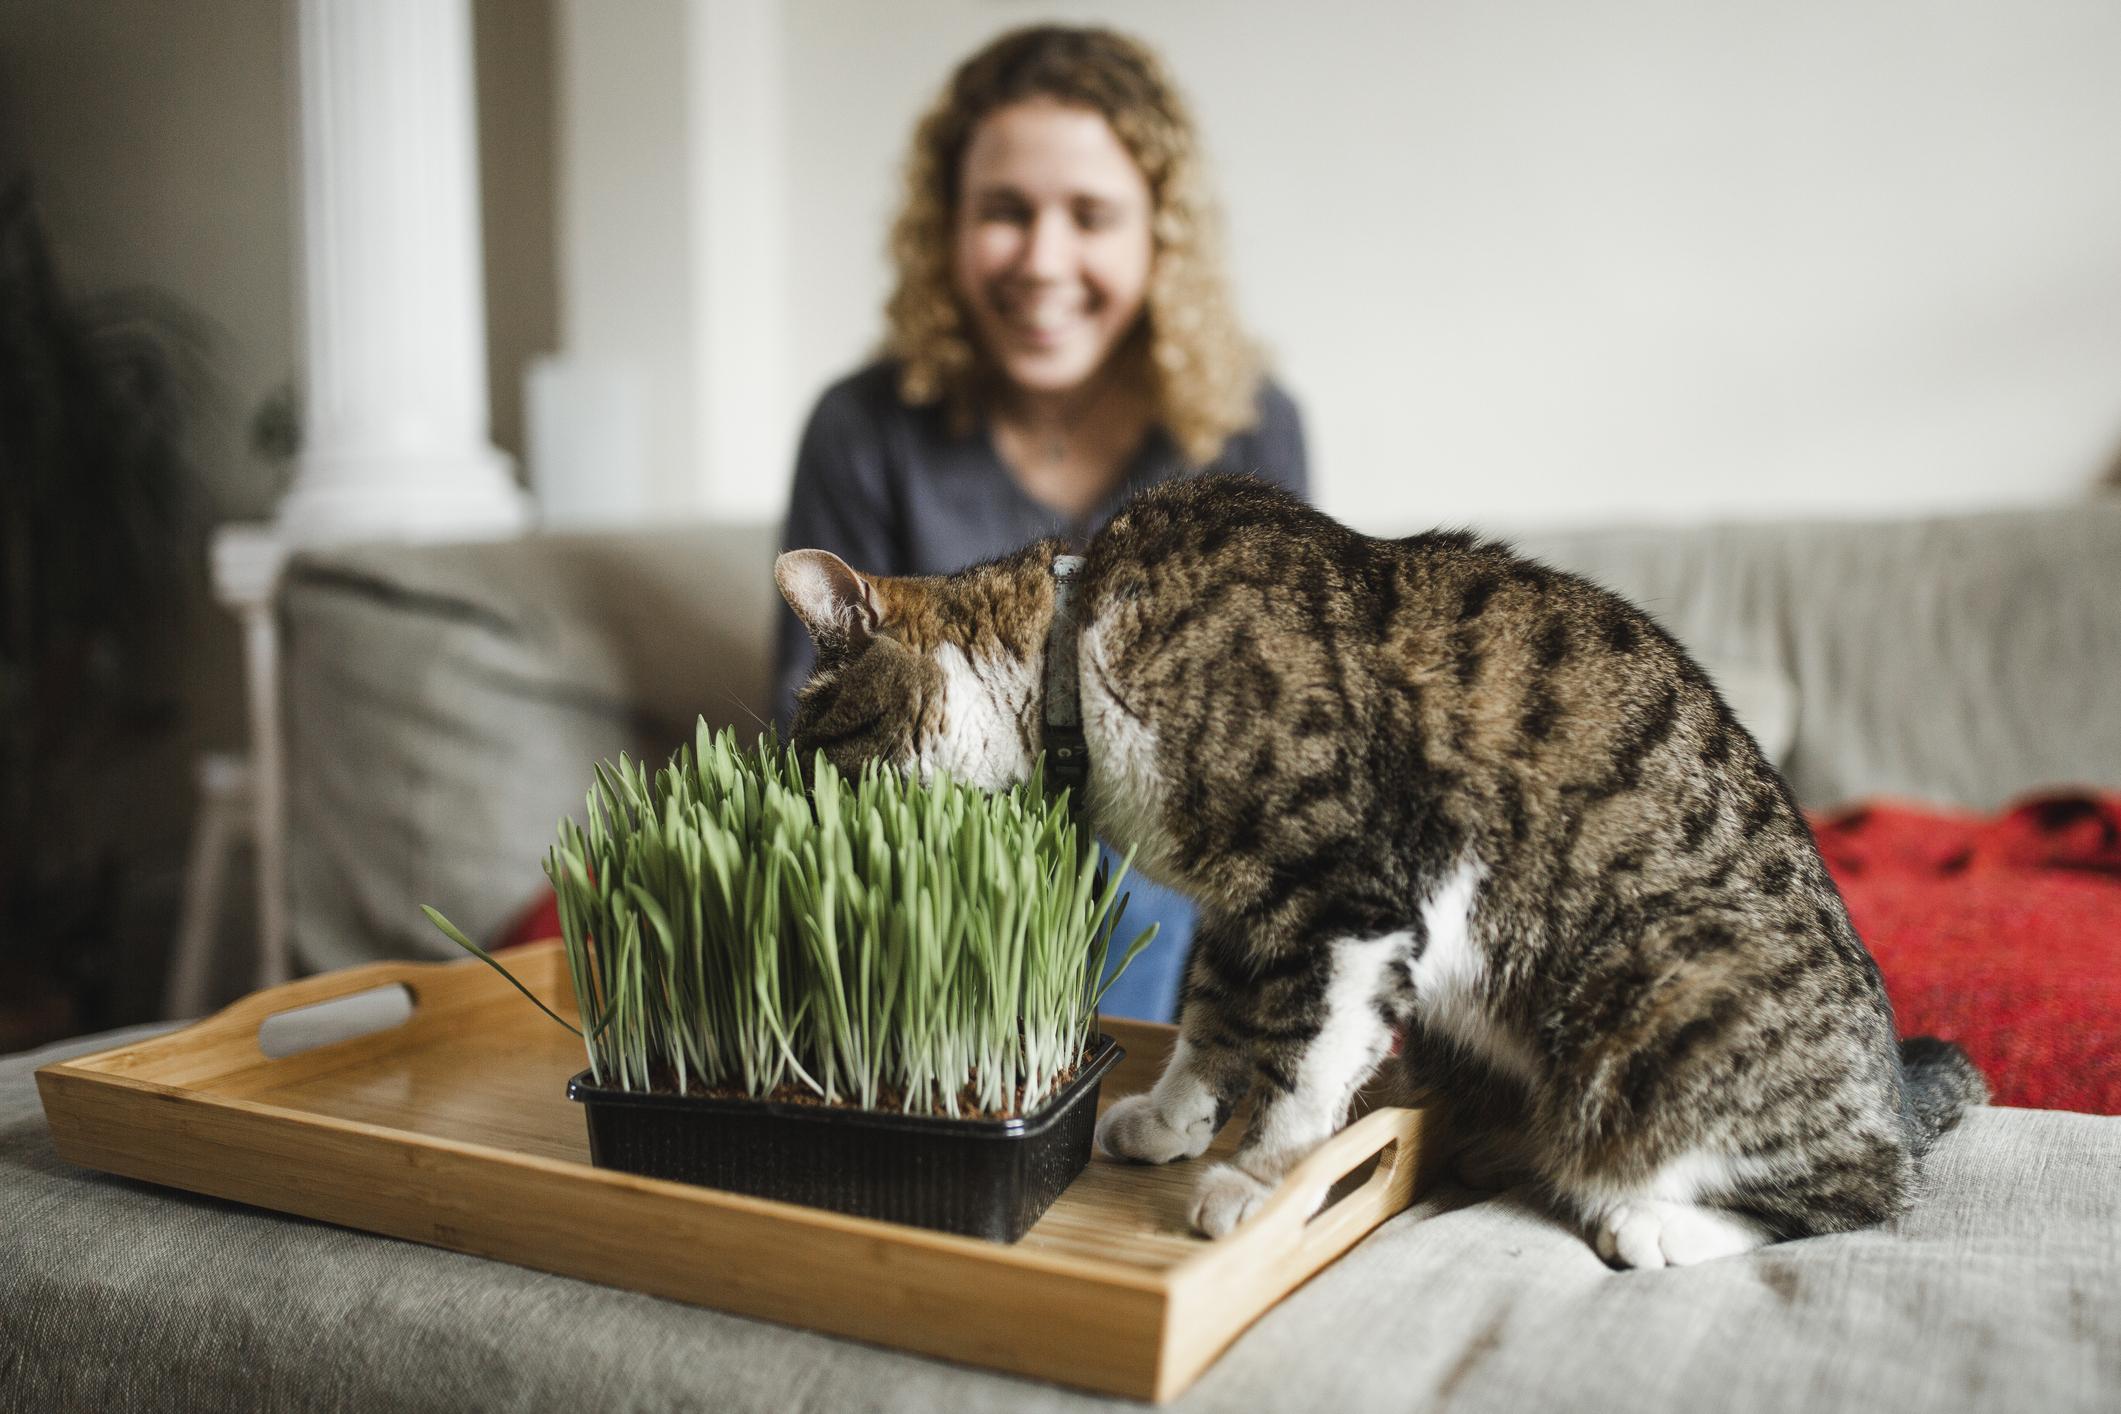 Cat is eating fresh green grass